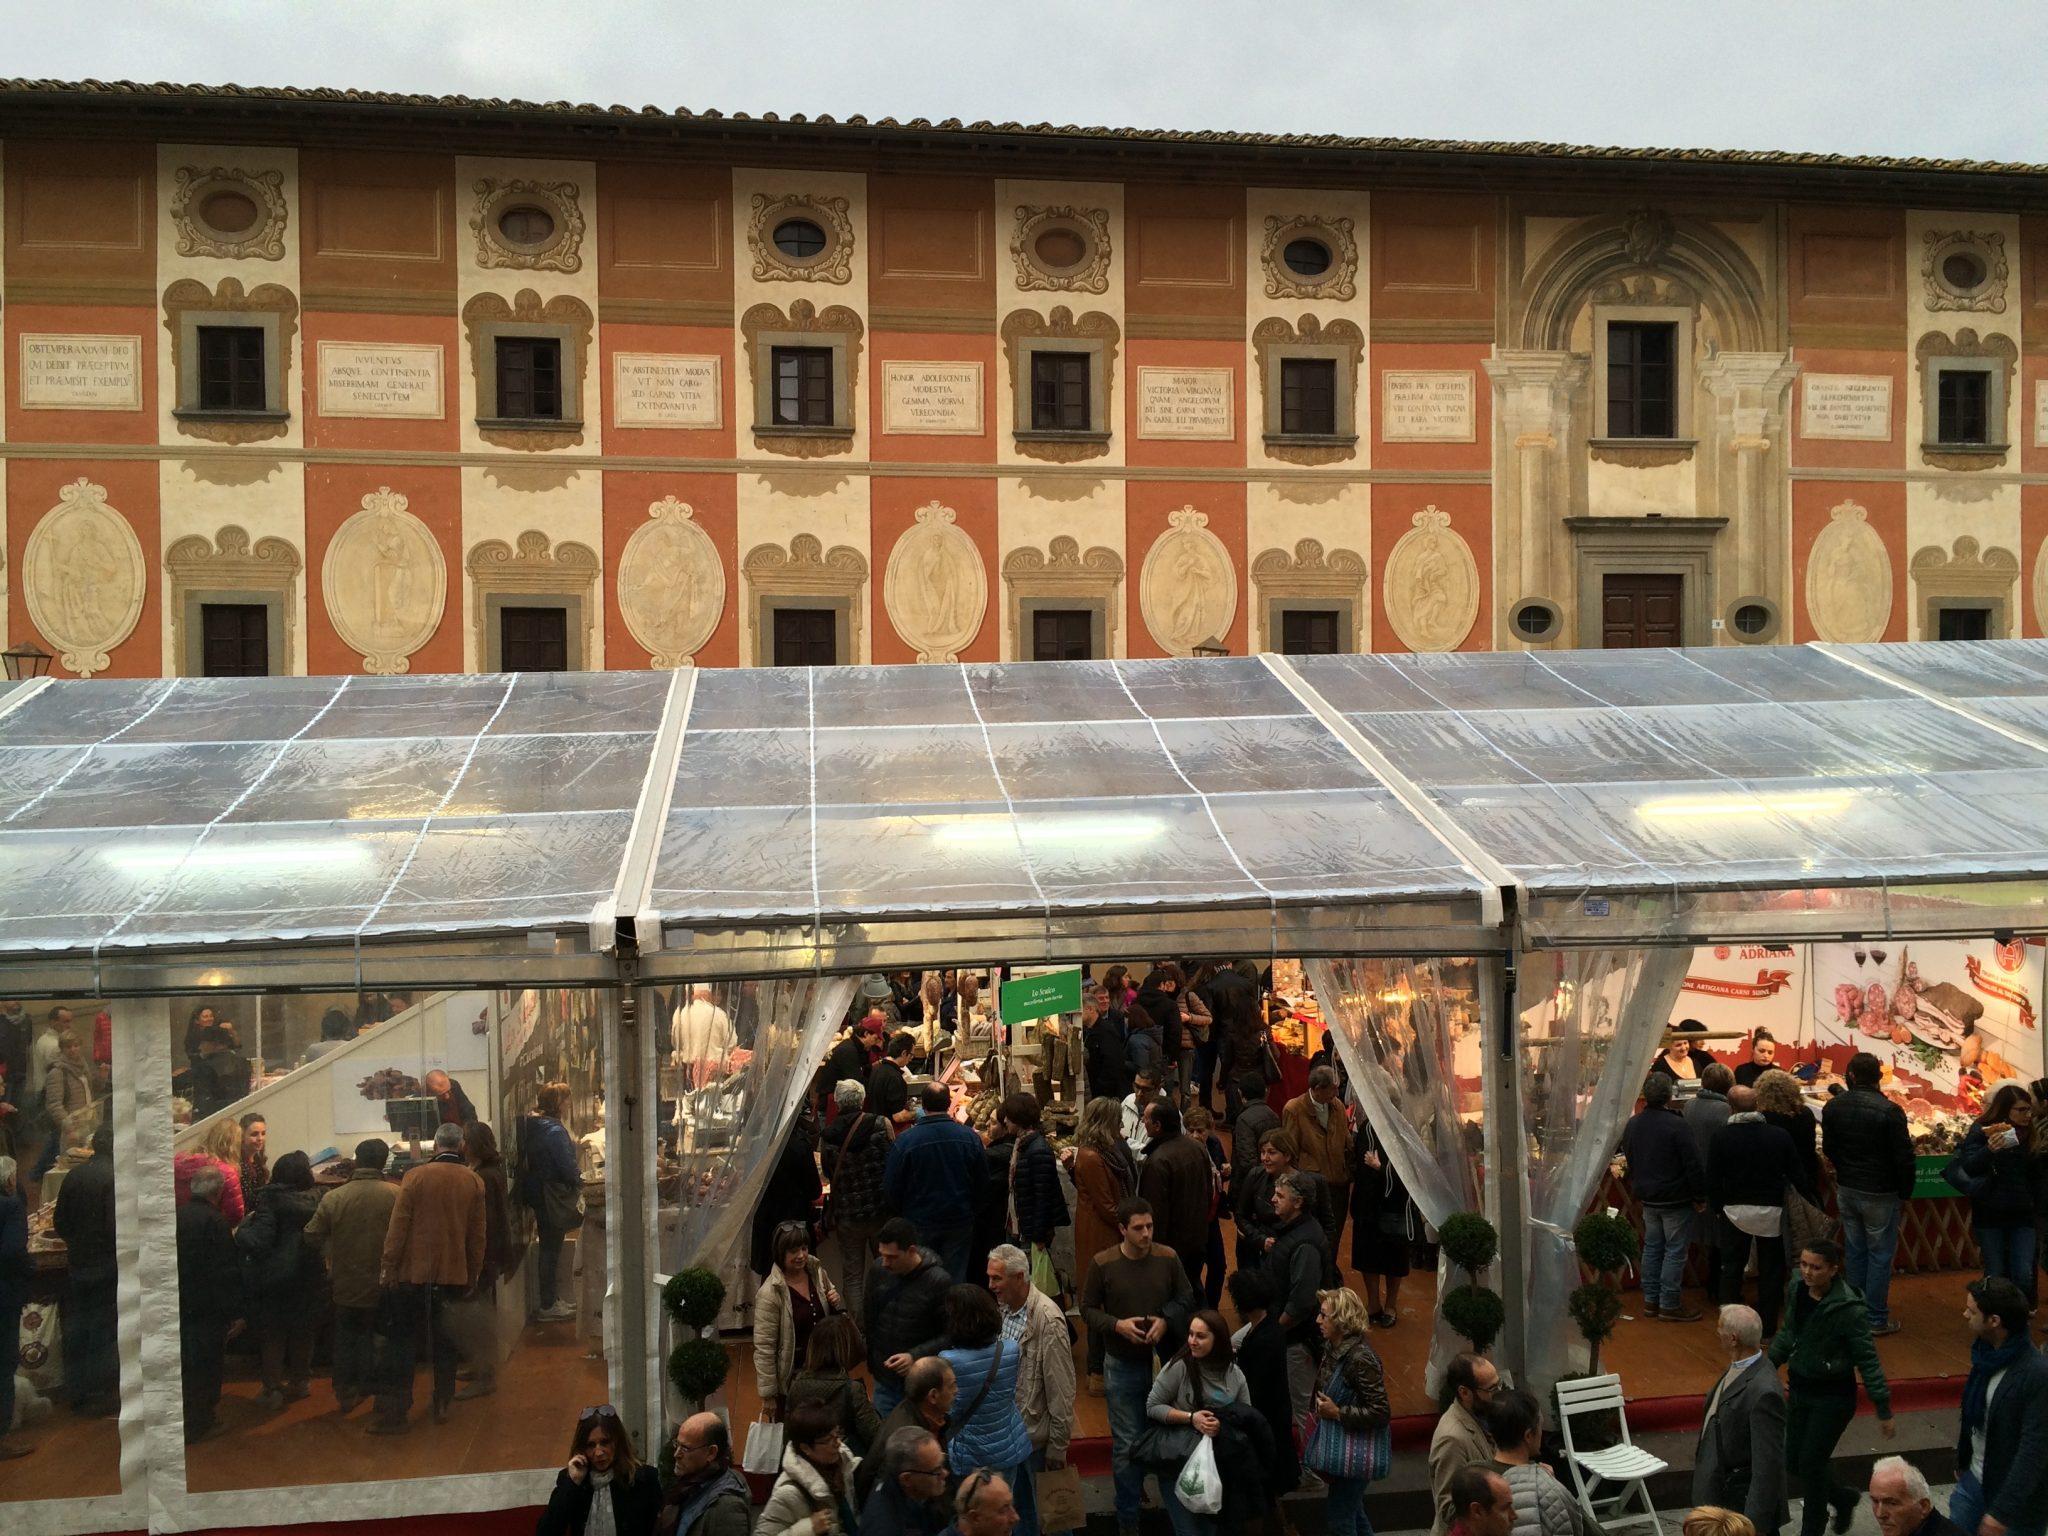 Truffle market and exhibition in San Miniato